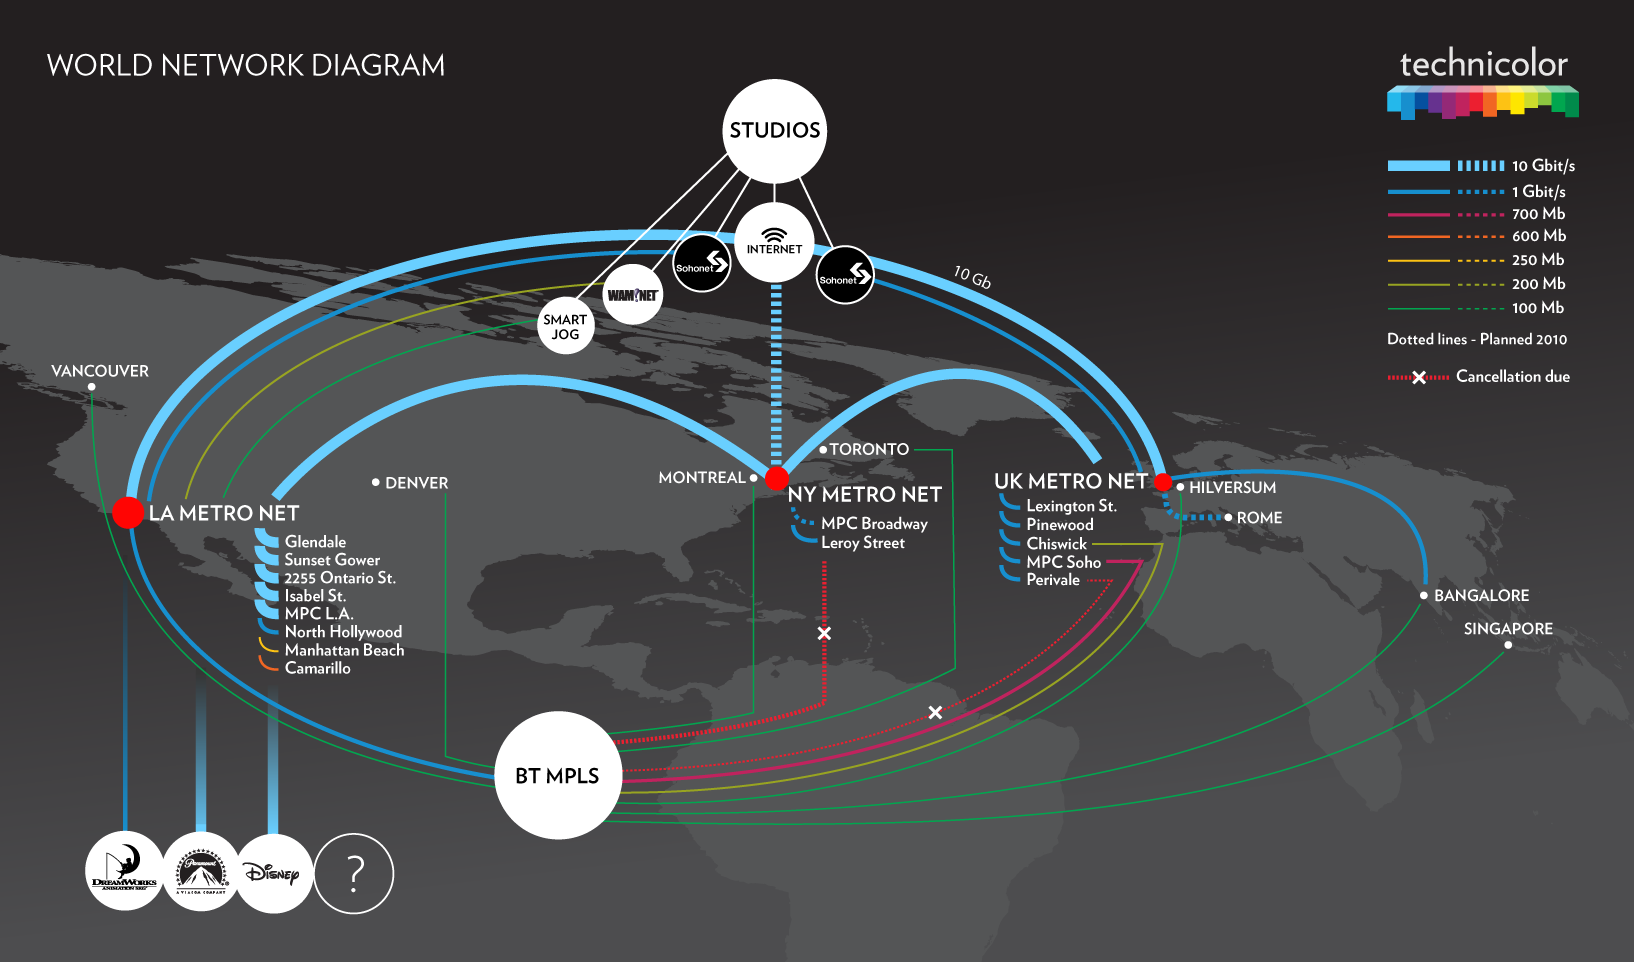 World network diagram